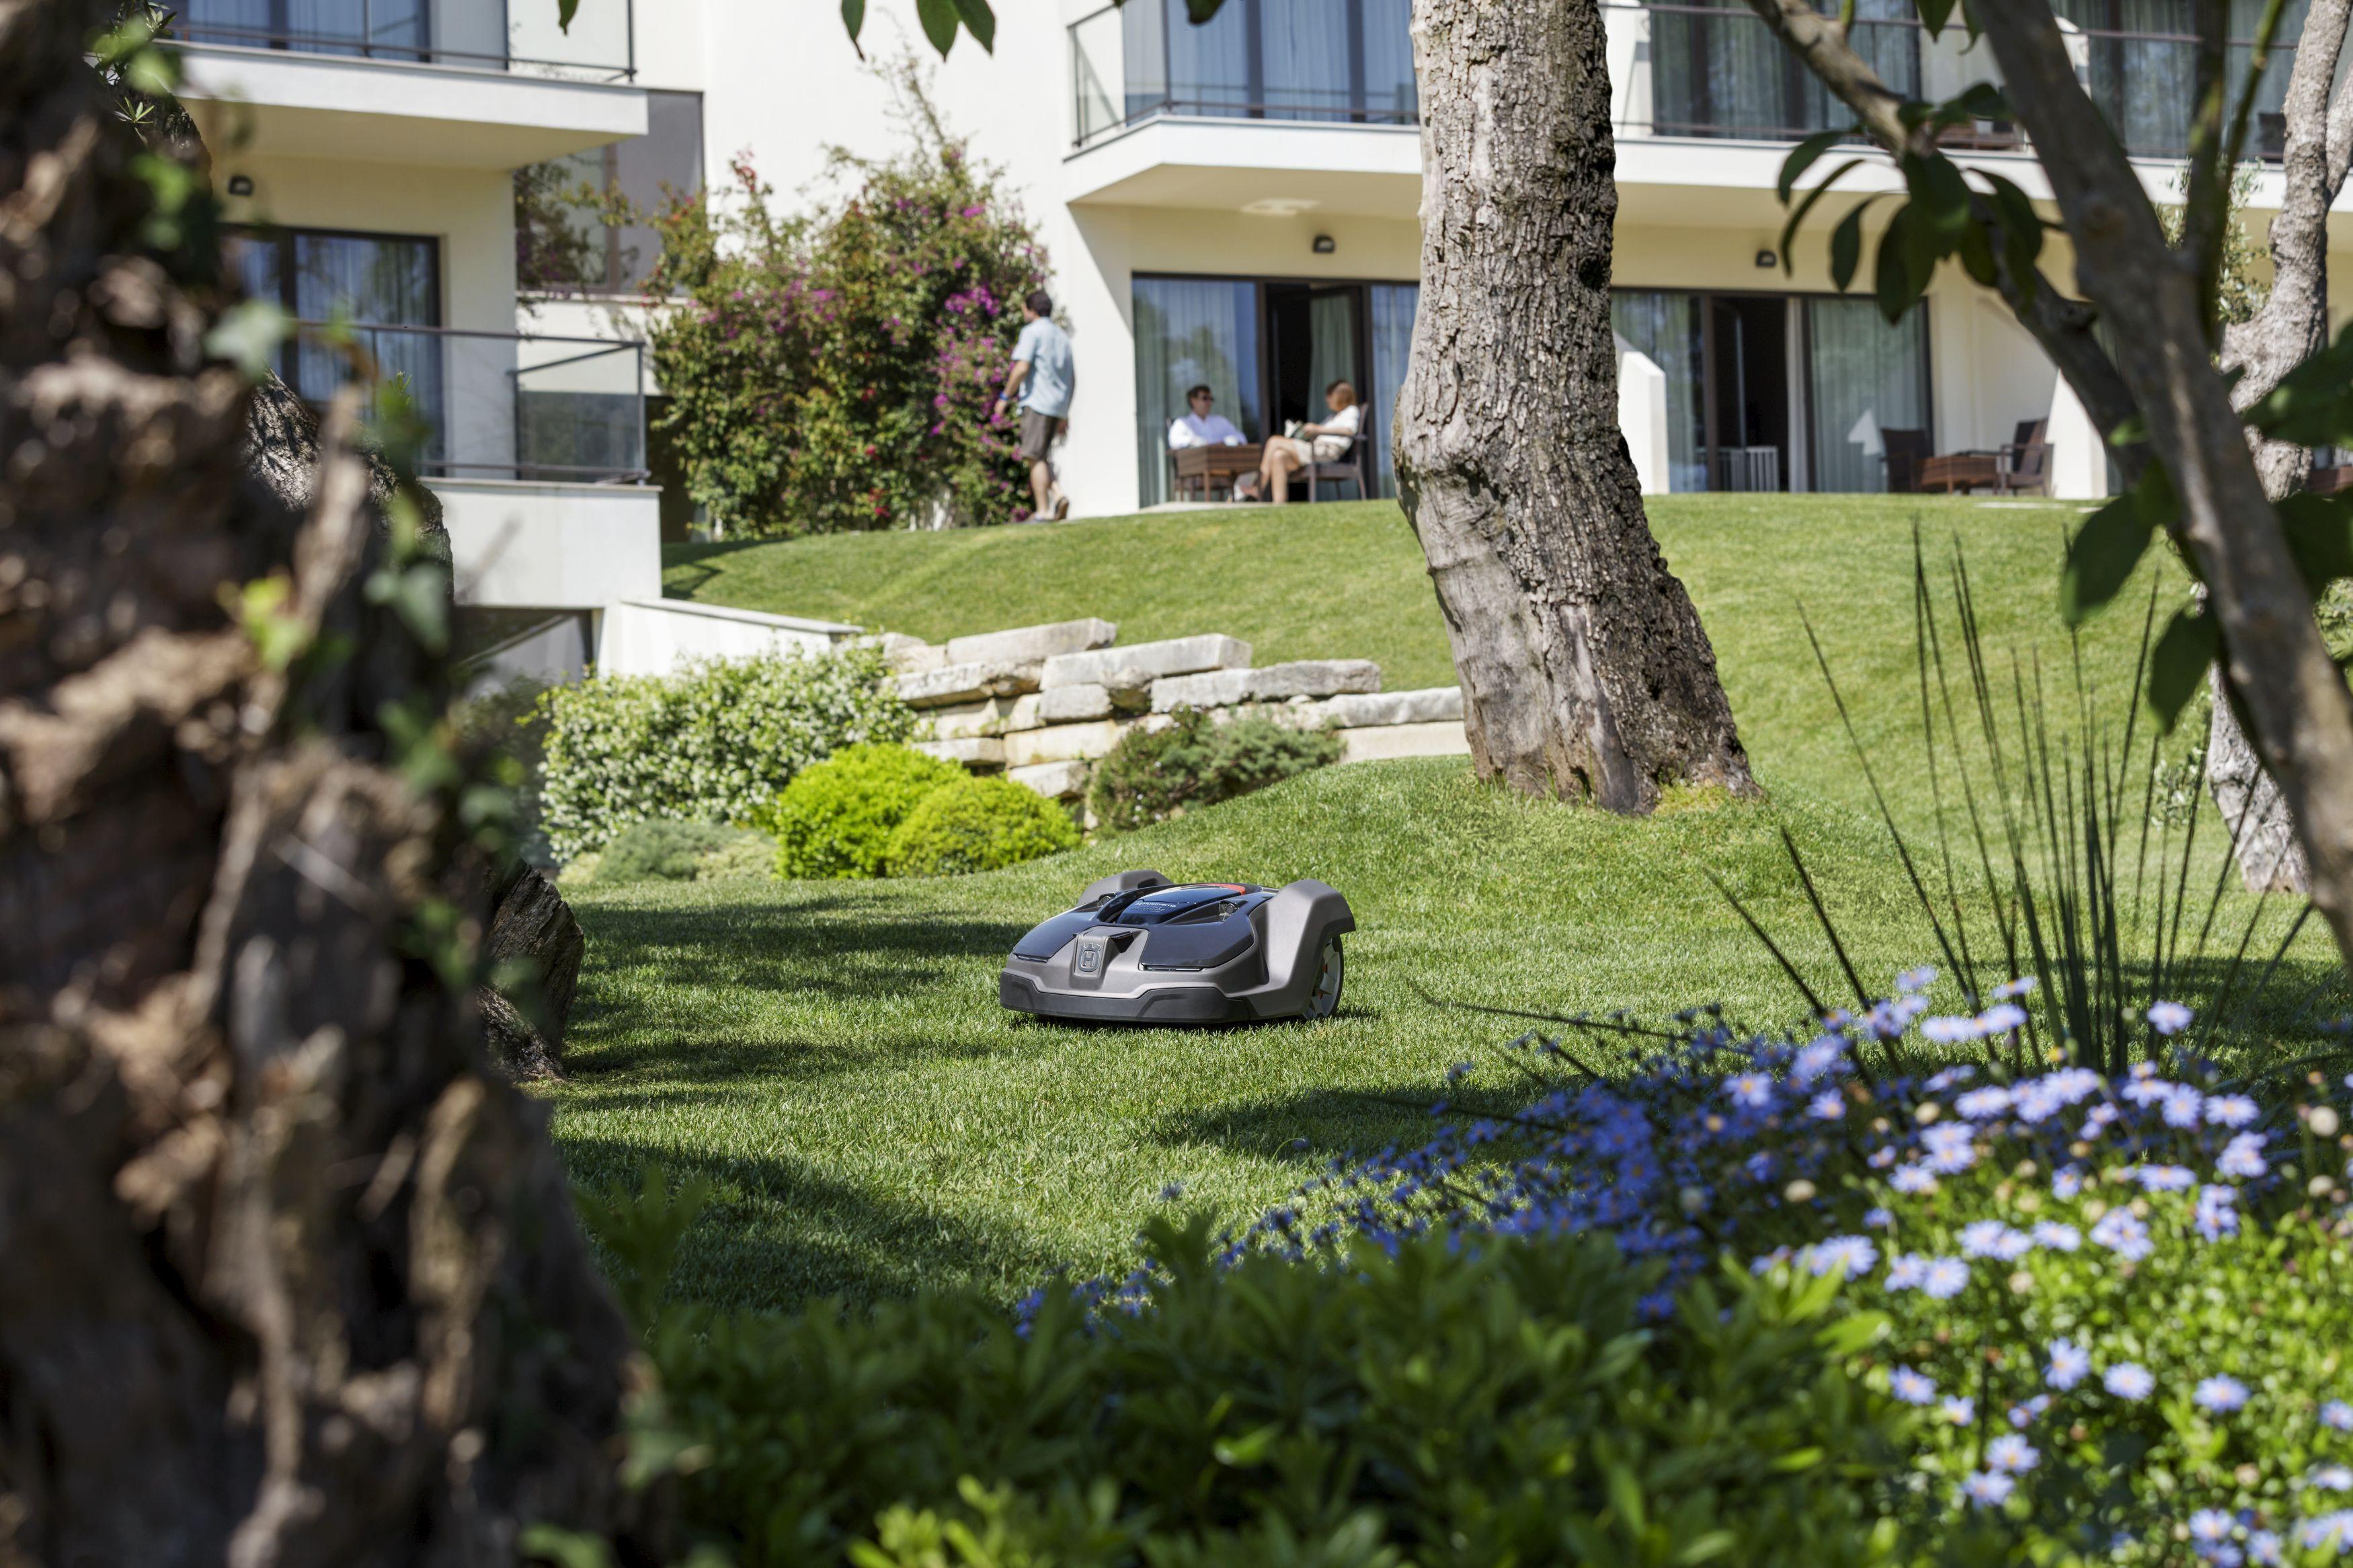 the future of lawn care | robotic lawn mowers | lawn care